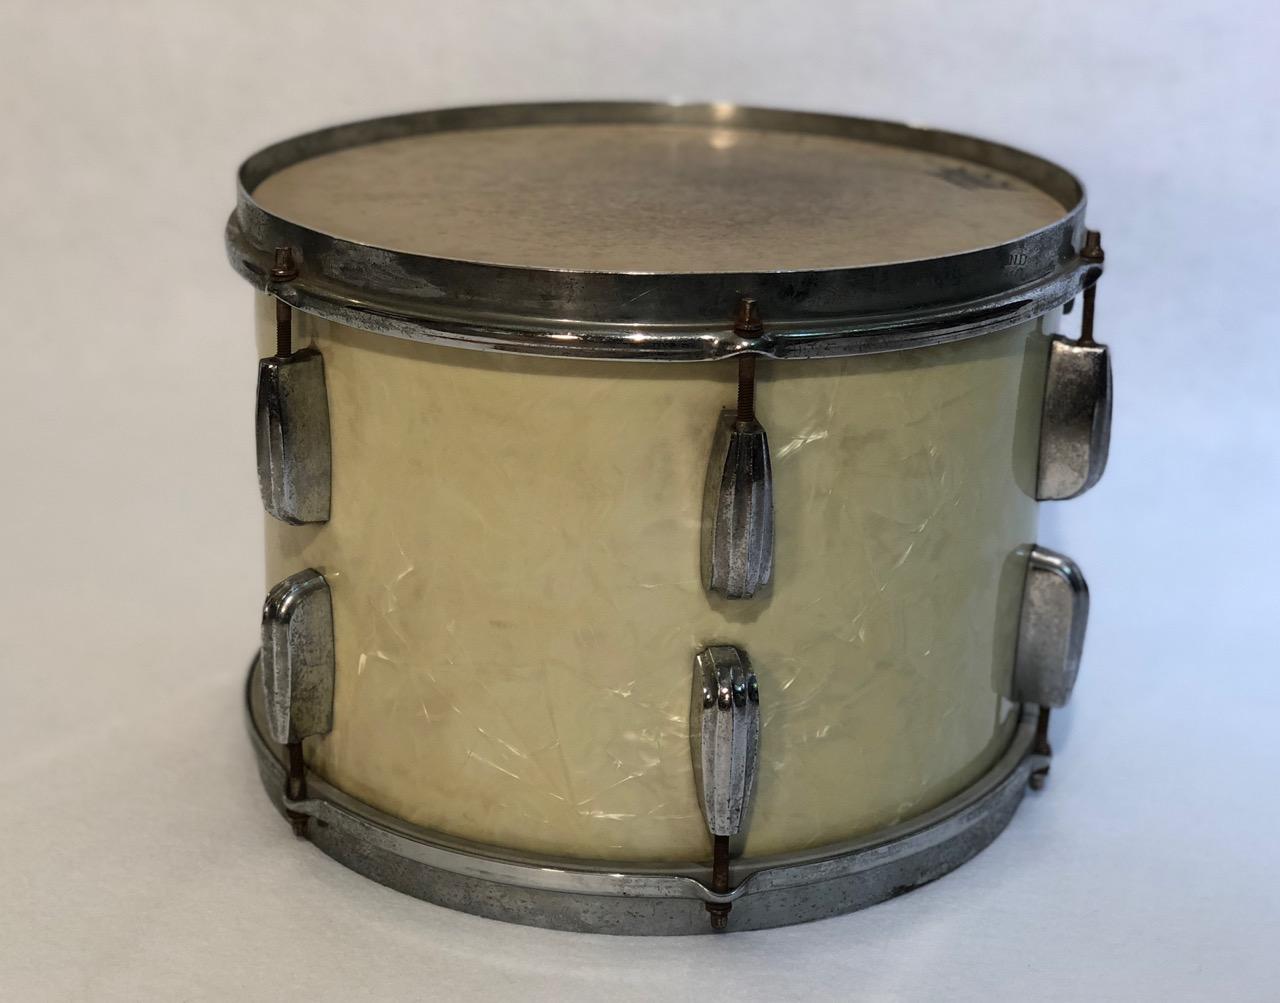 Gene Krupa drums, famous vintage drums, vintage instrument collection, drum collector, collectable antique